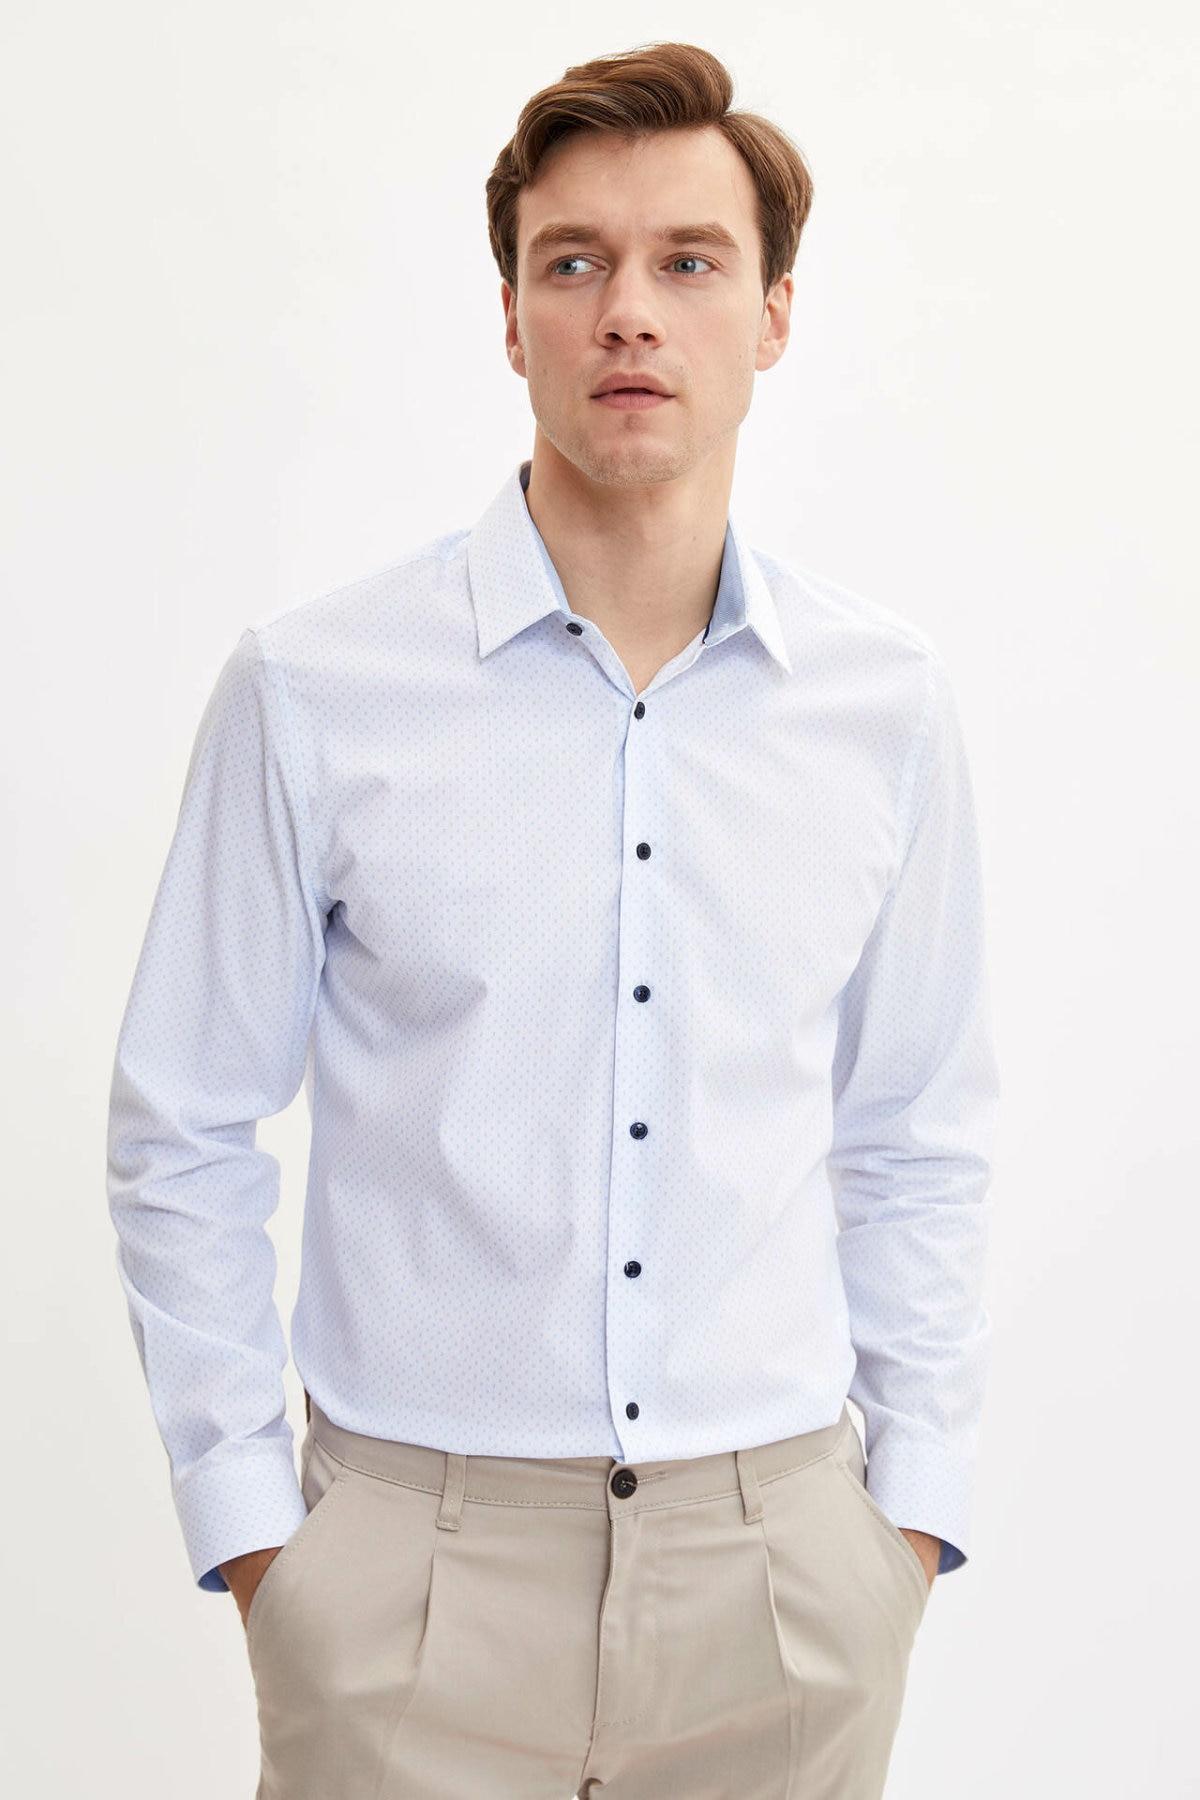 DeFacto Men Fashion Formal White Solid Lapel Collar Shirt Woven Top Long Sleeve Shirt Office Business Wear Top Shirt-L5420AZ19AU